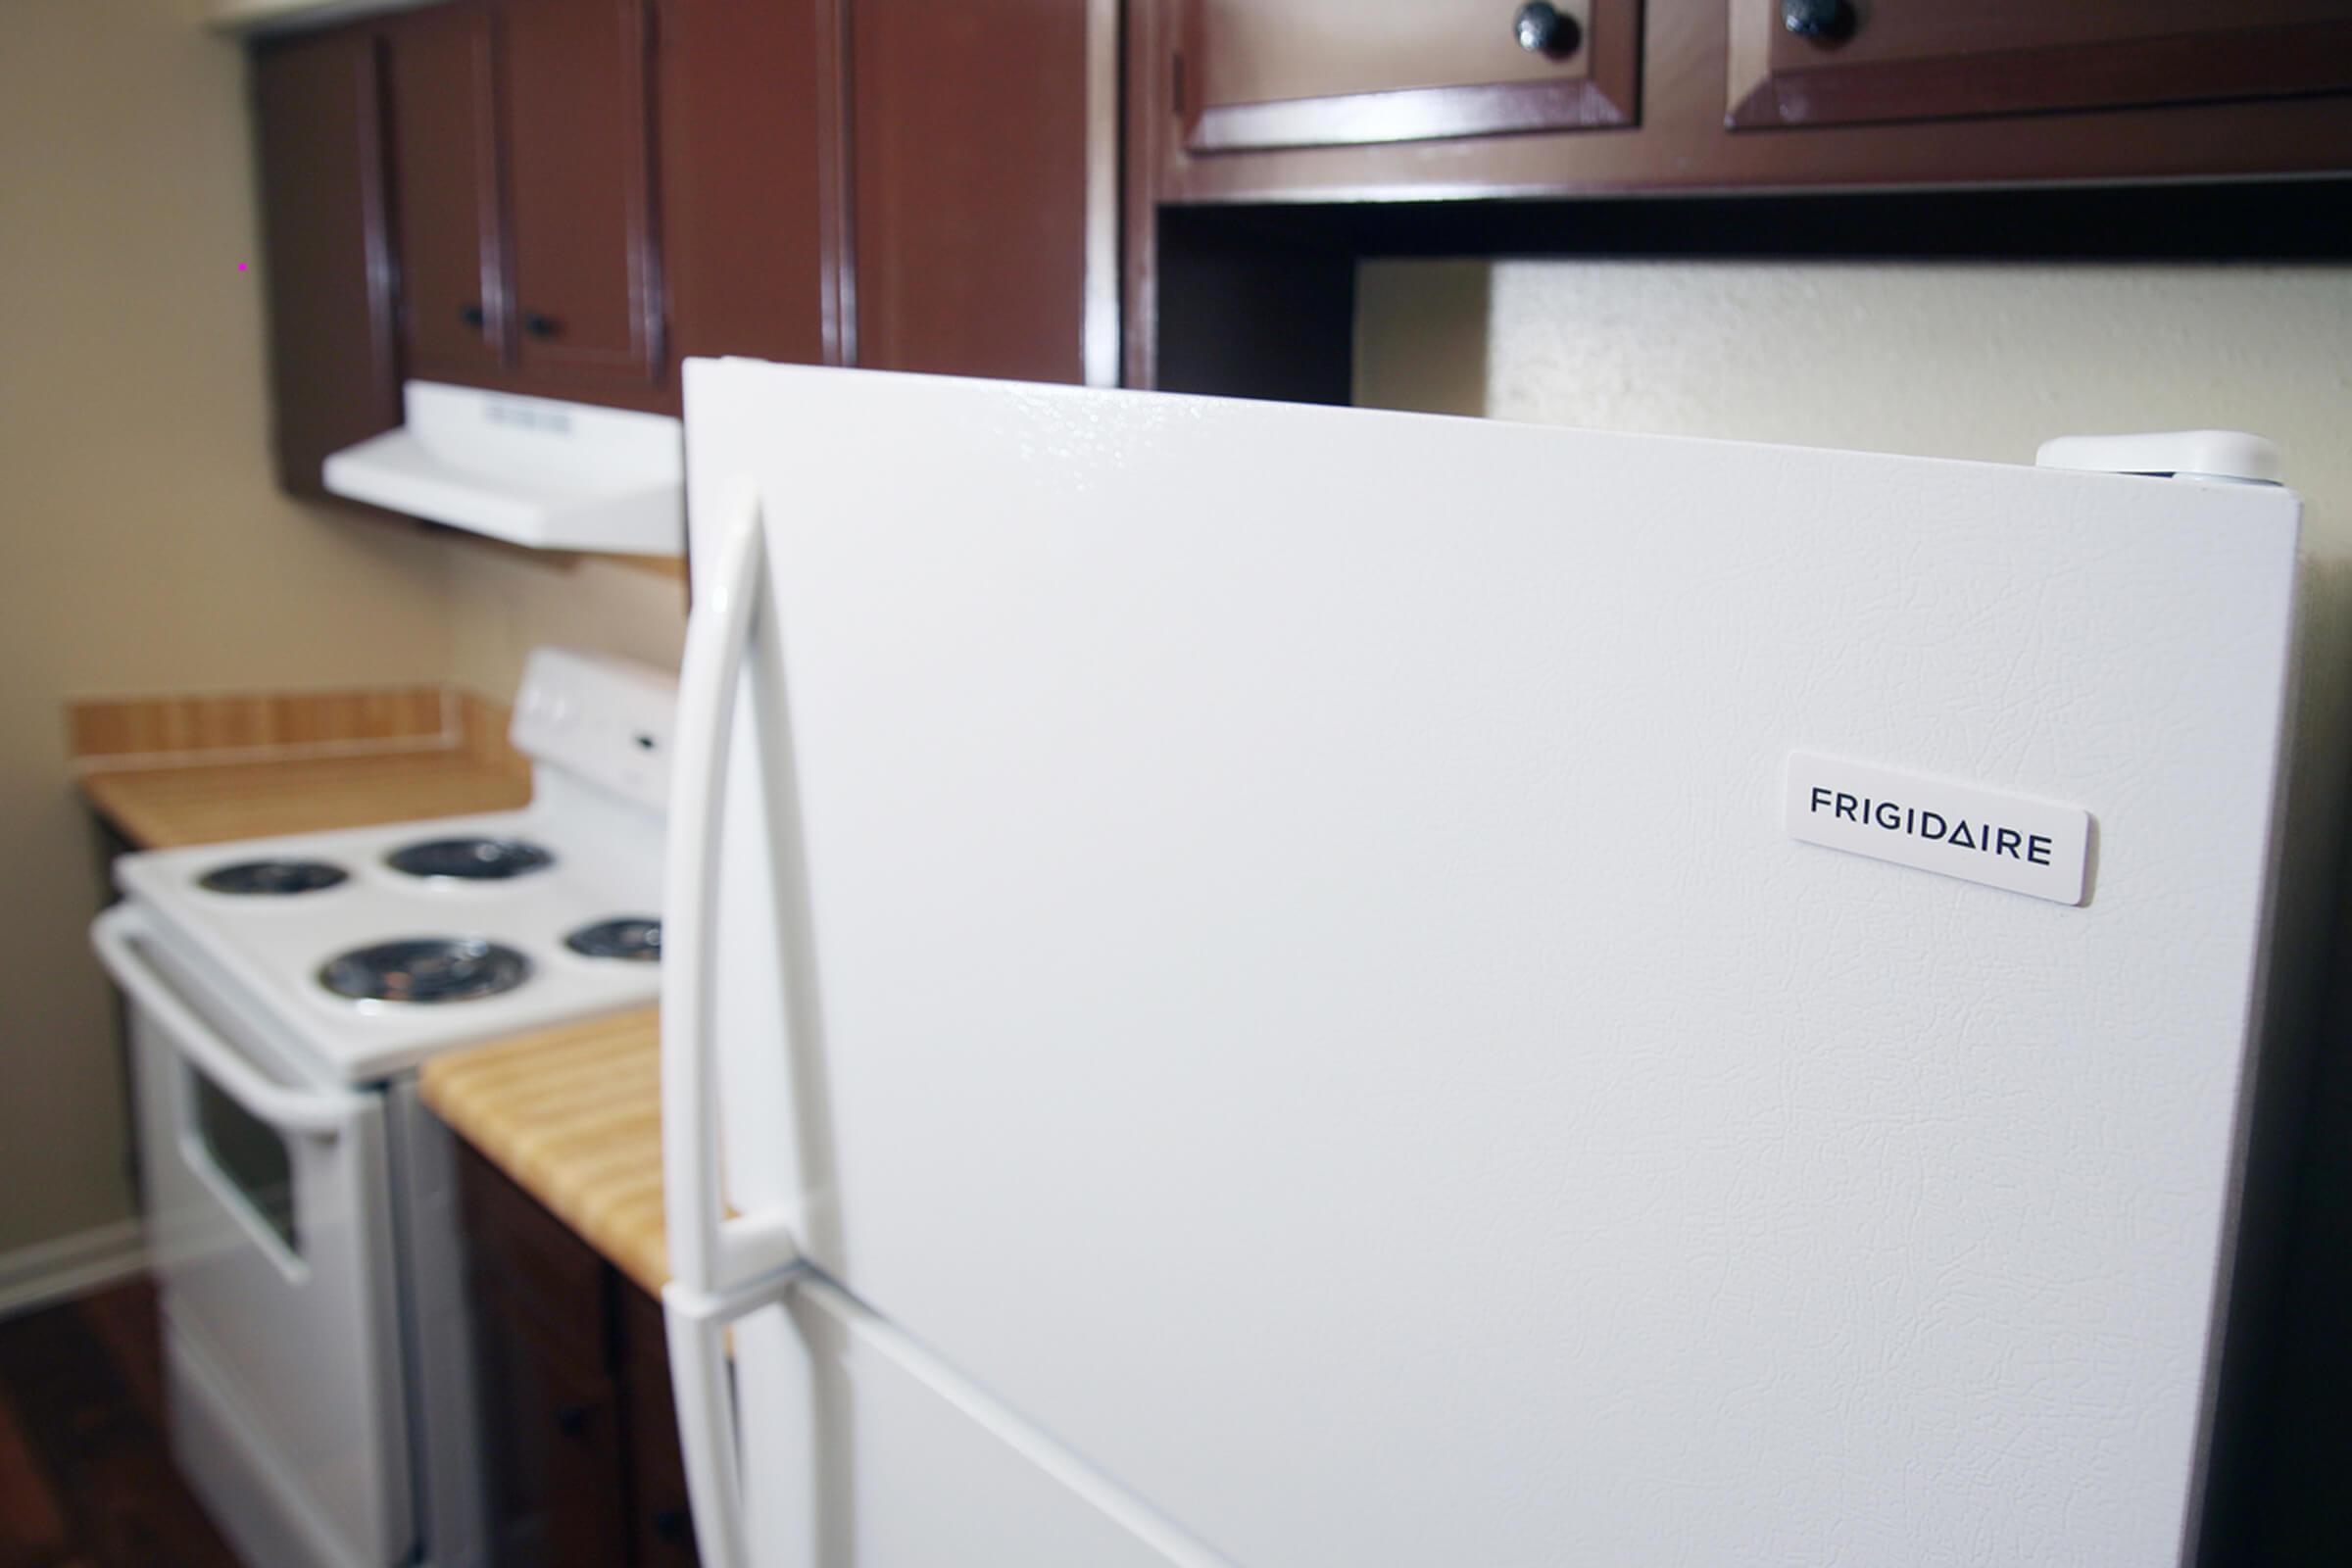 a white refrigerator freezer sitting in a box